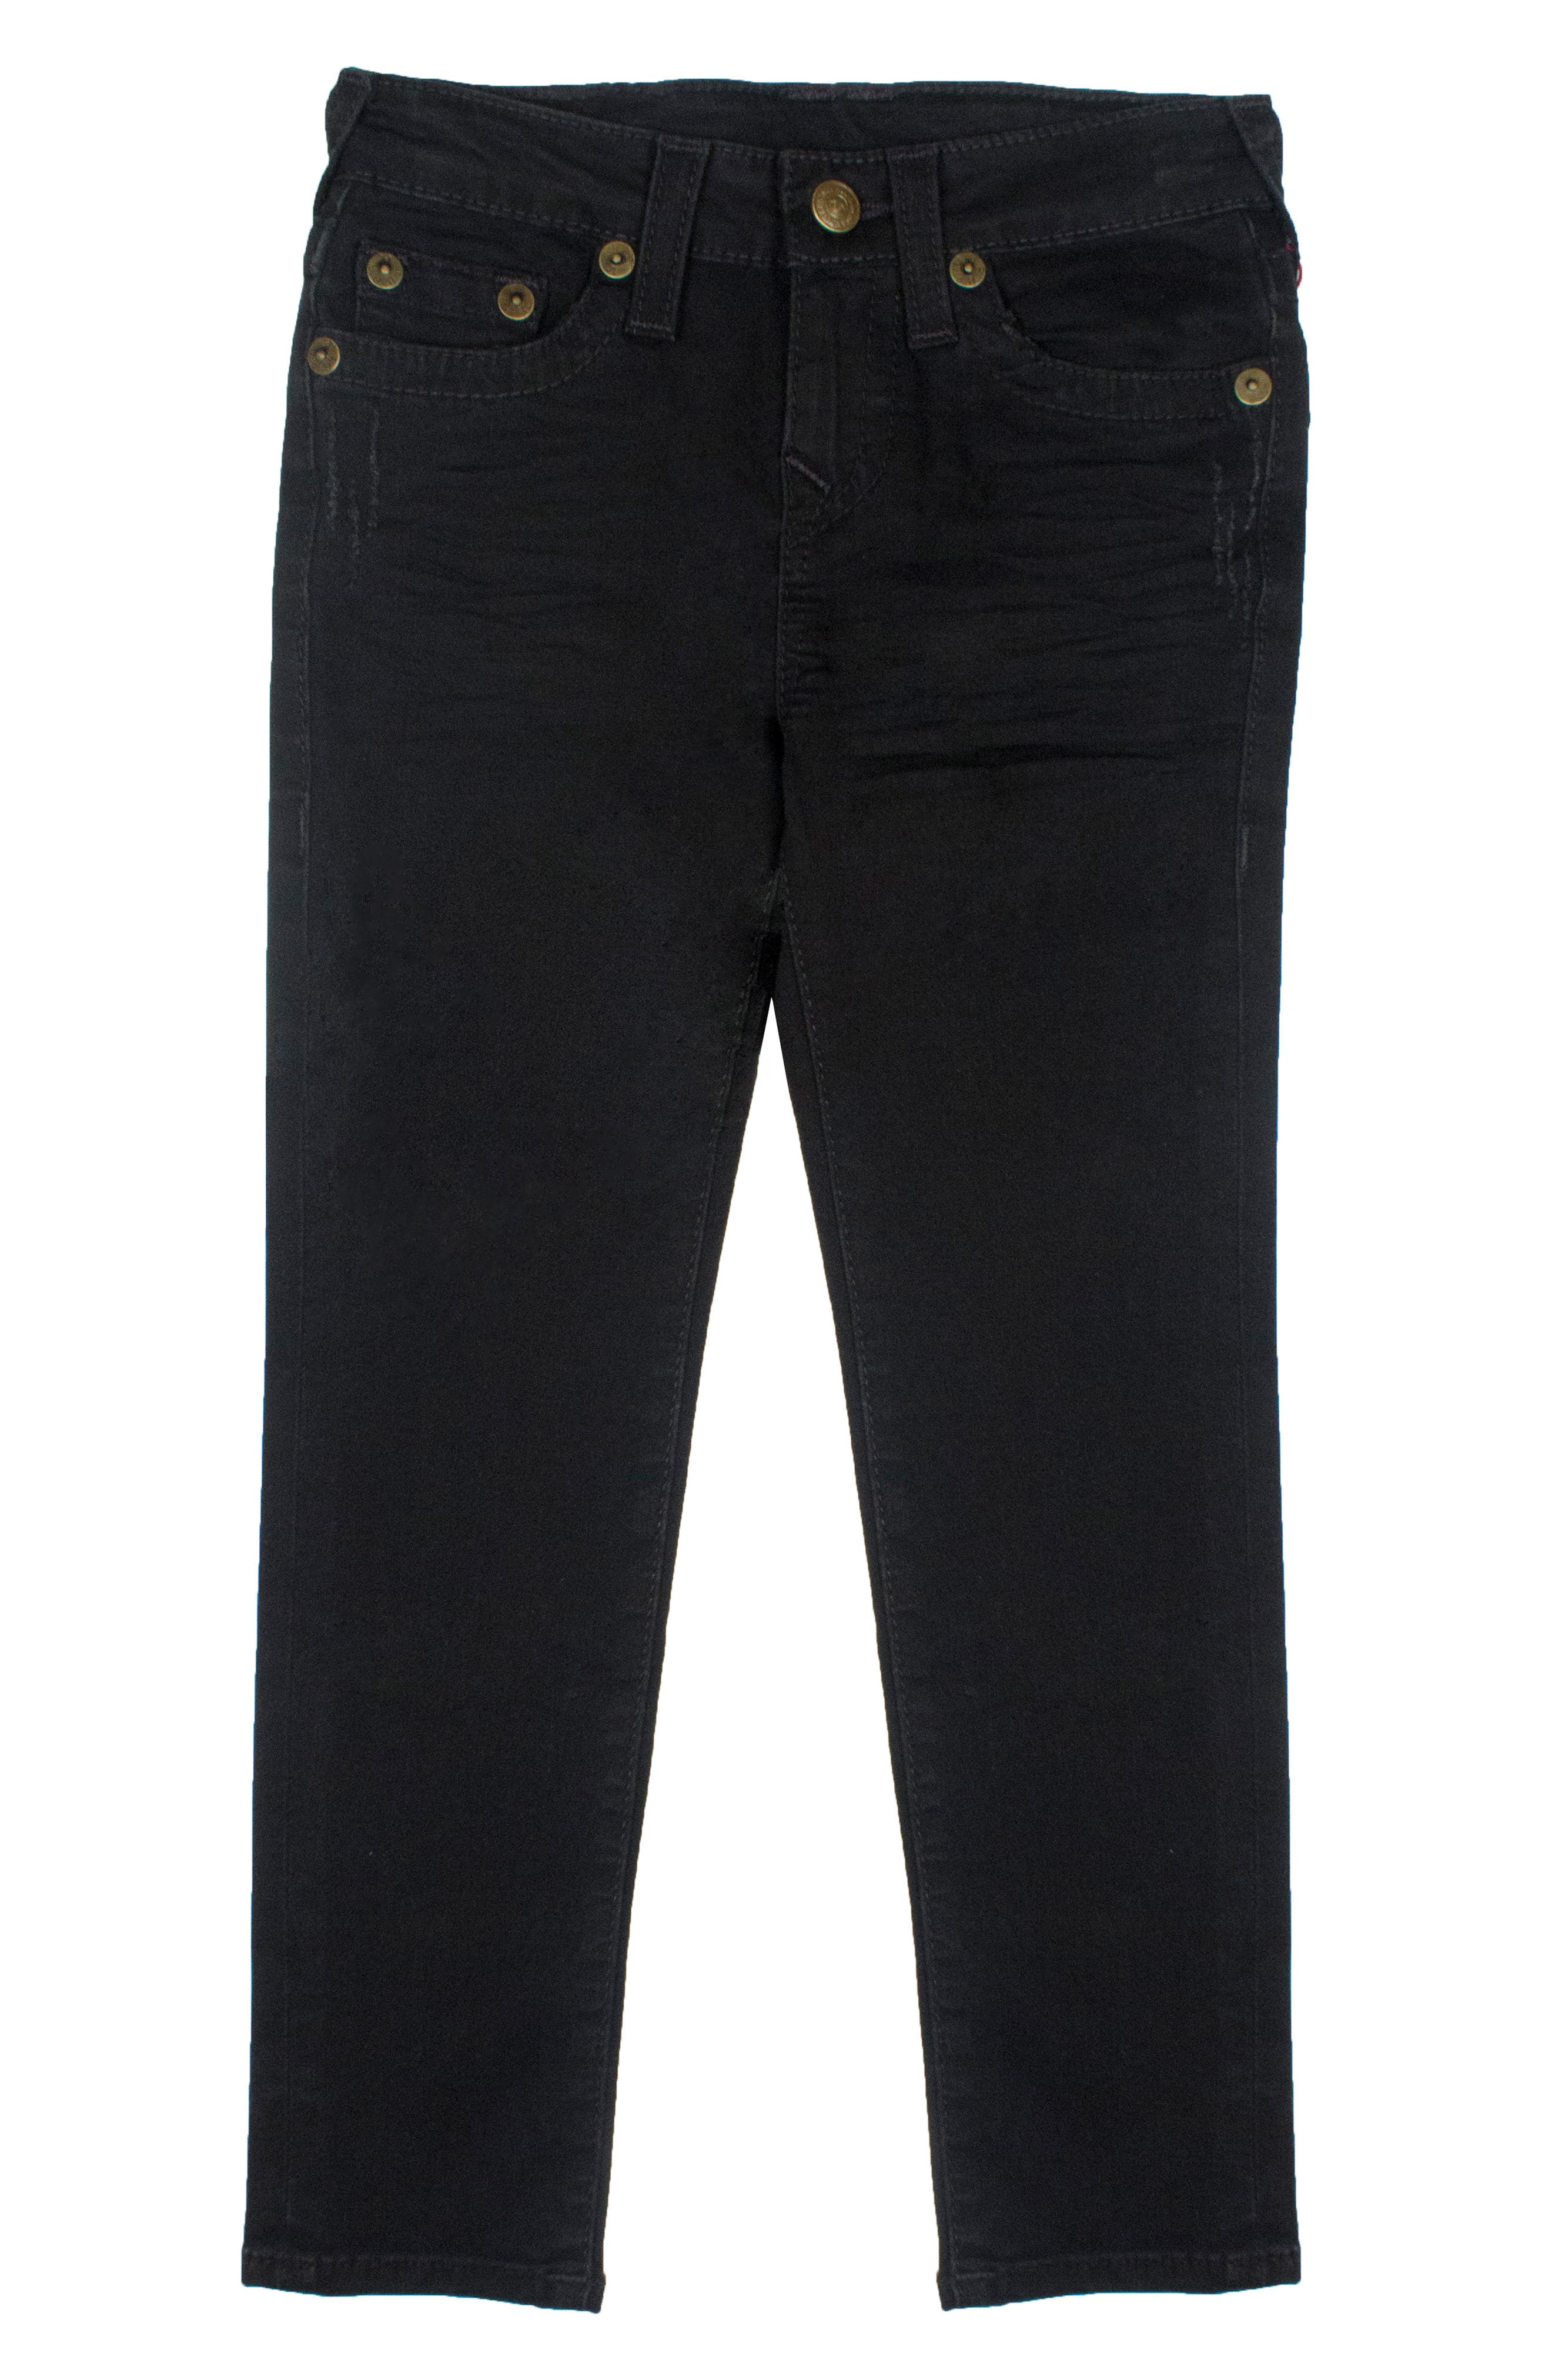 True Religion Brand Jeans Geno Single End Jeans (Toddler Boys & Little Boys)